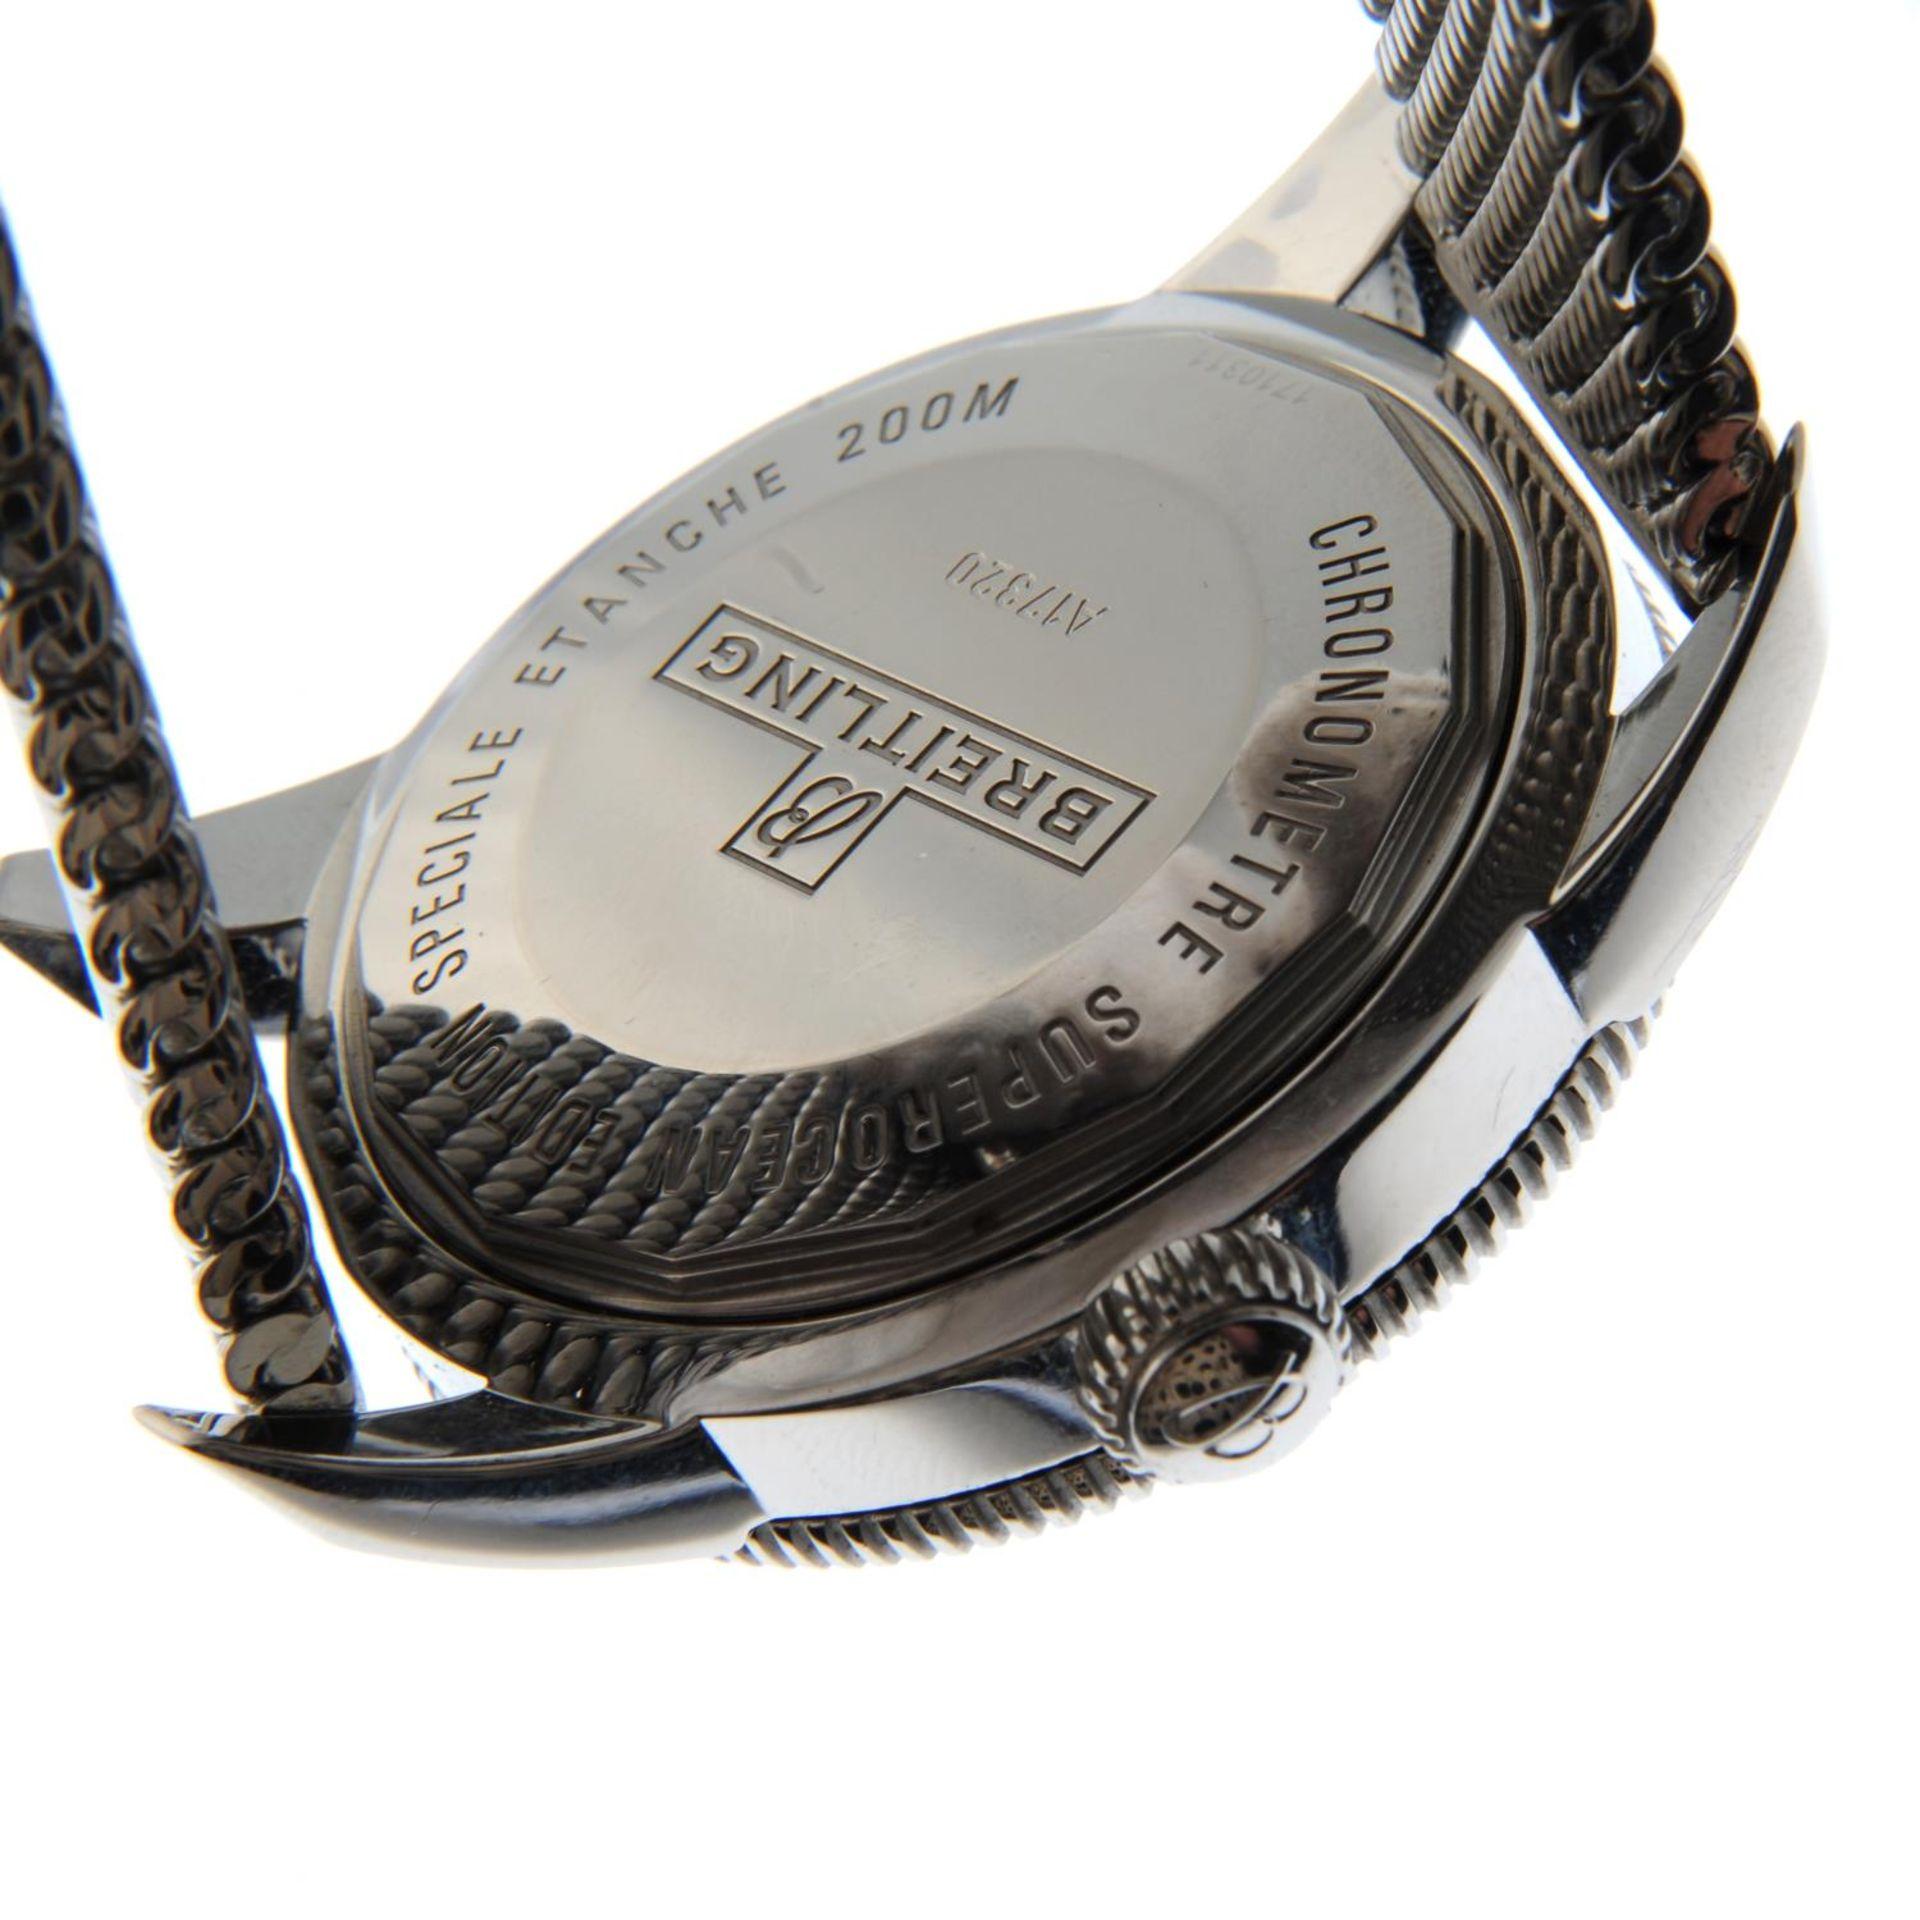 BREITLING - a SuperOcean Heritage 46 bracelet watch. - Bild 2 aus 6